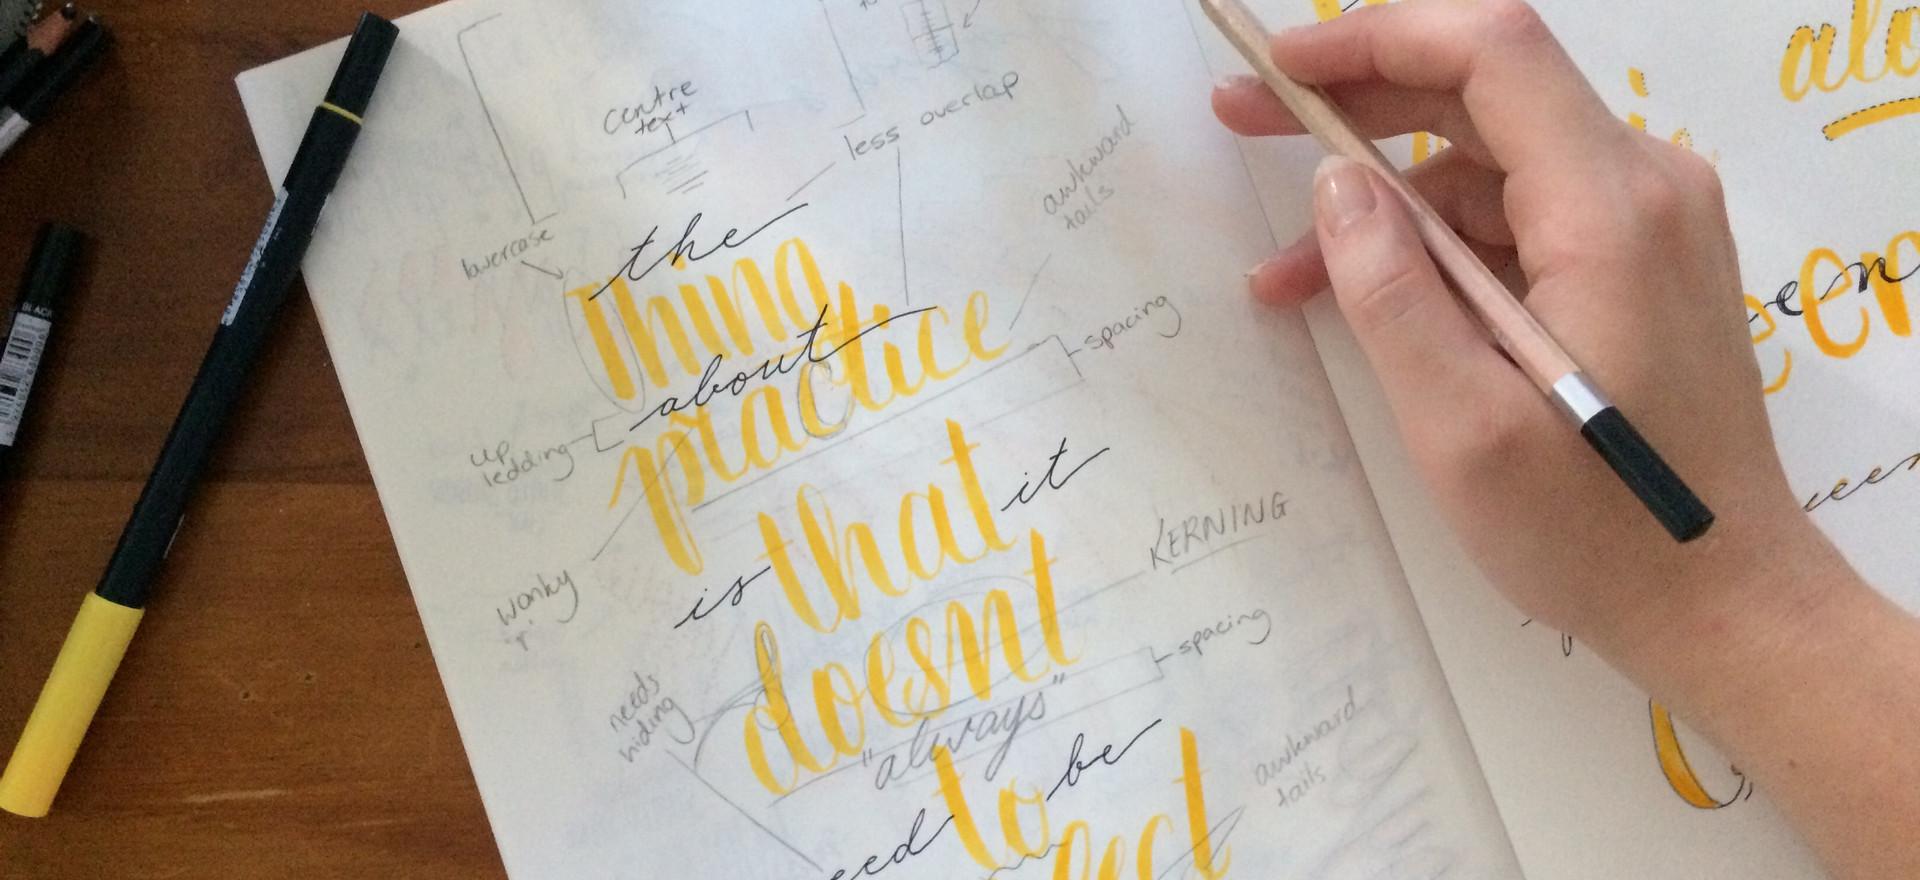 Katie Wittle Designs - Hand Lettering